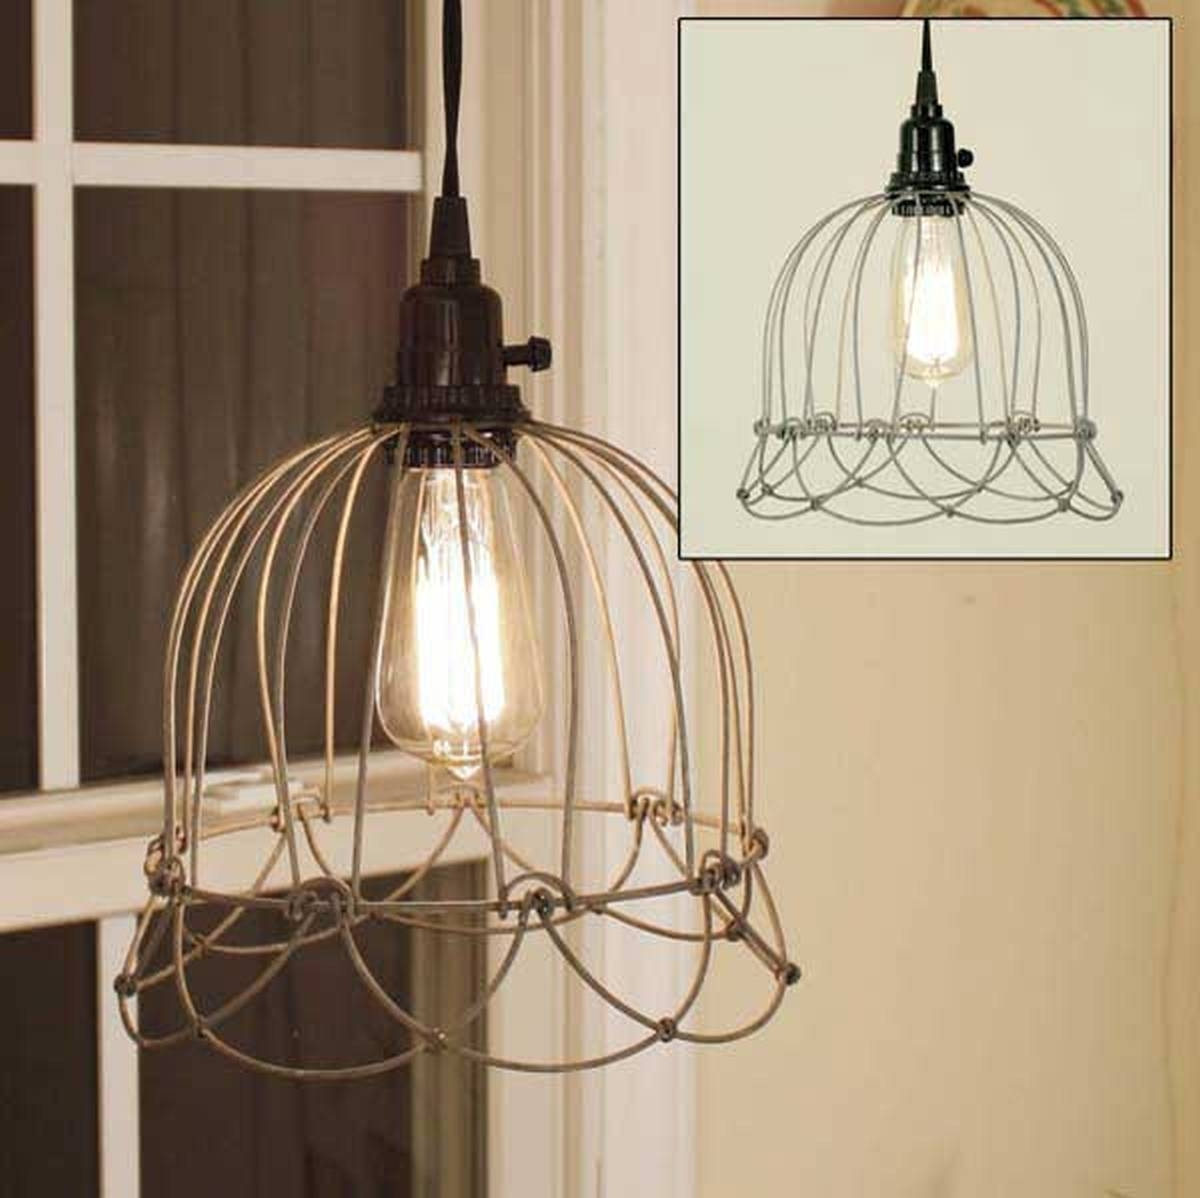 Popular Photo of Corded Pendant Lights